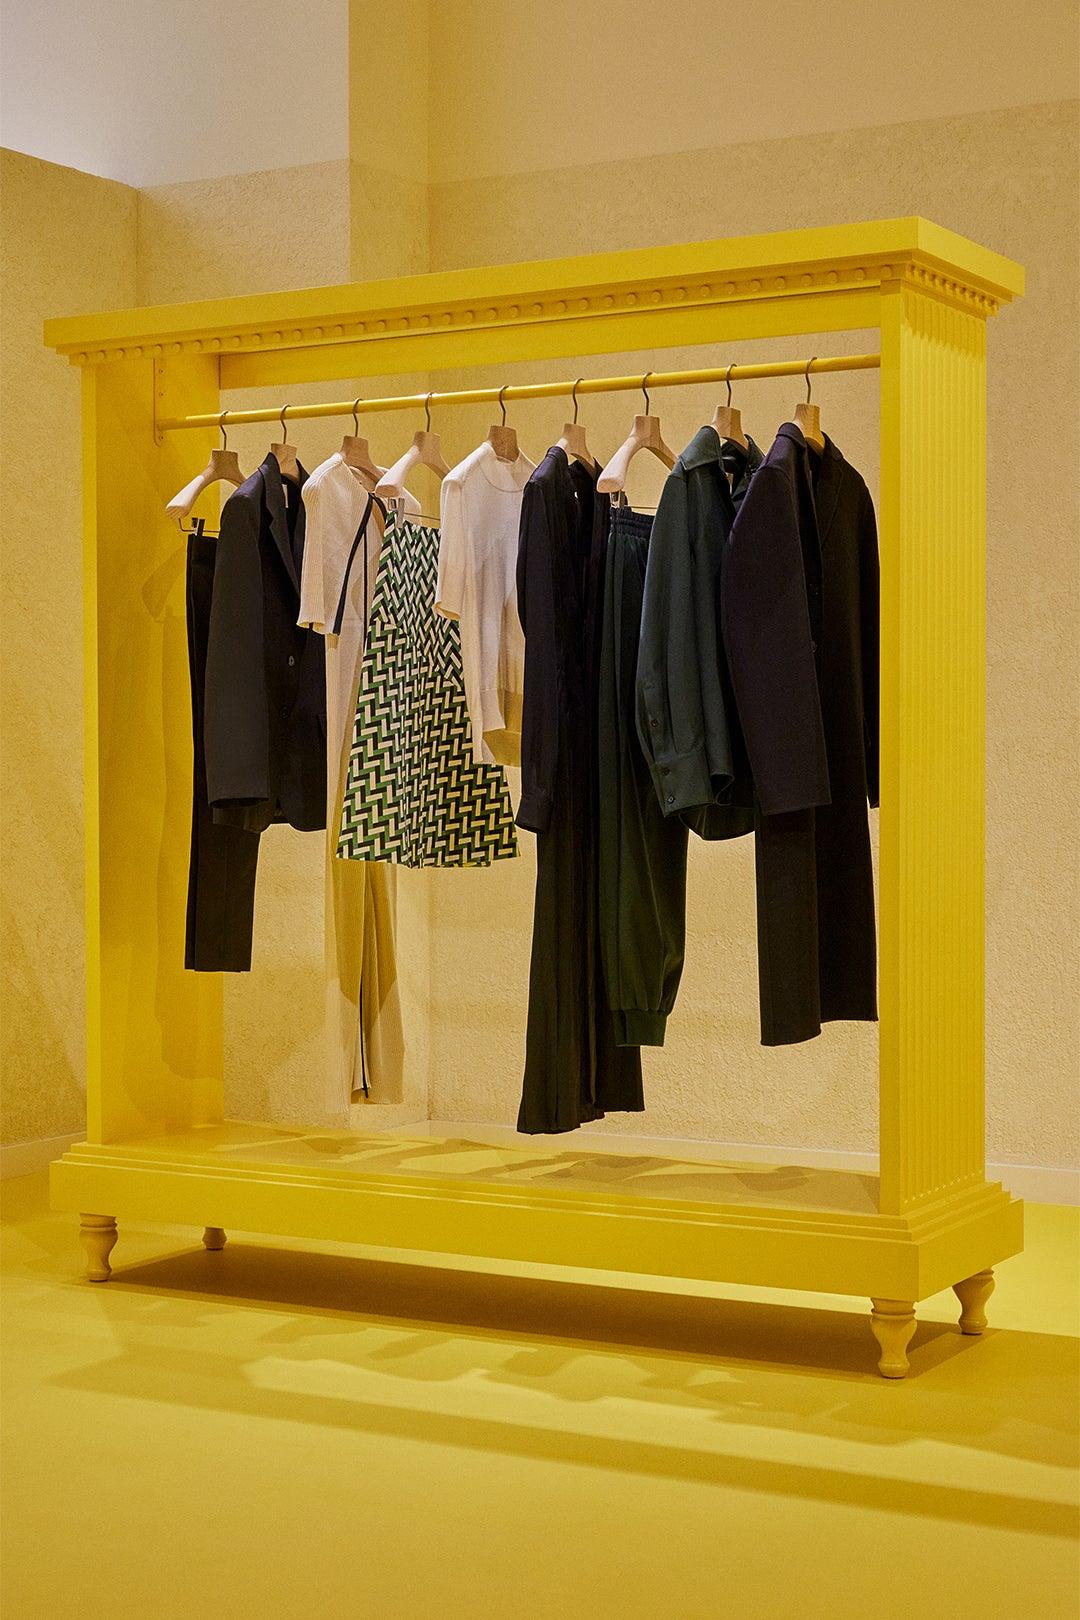 yellow clothing rack